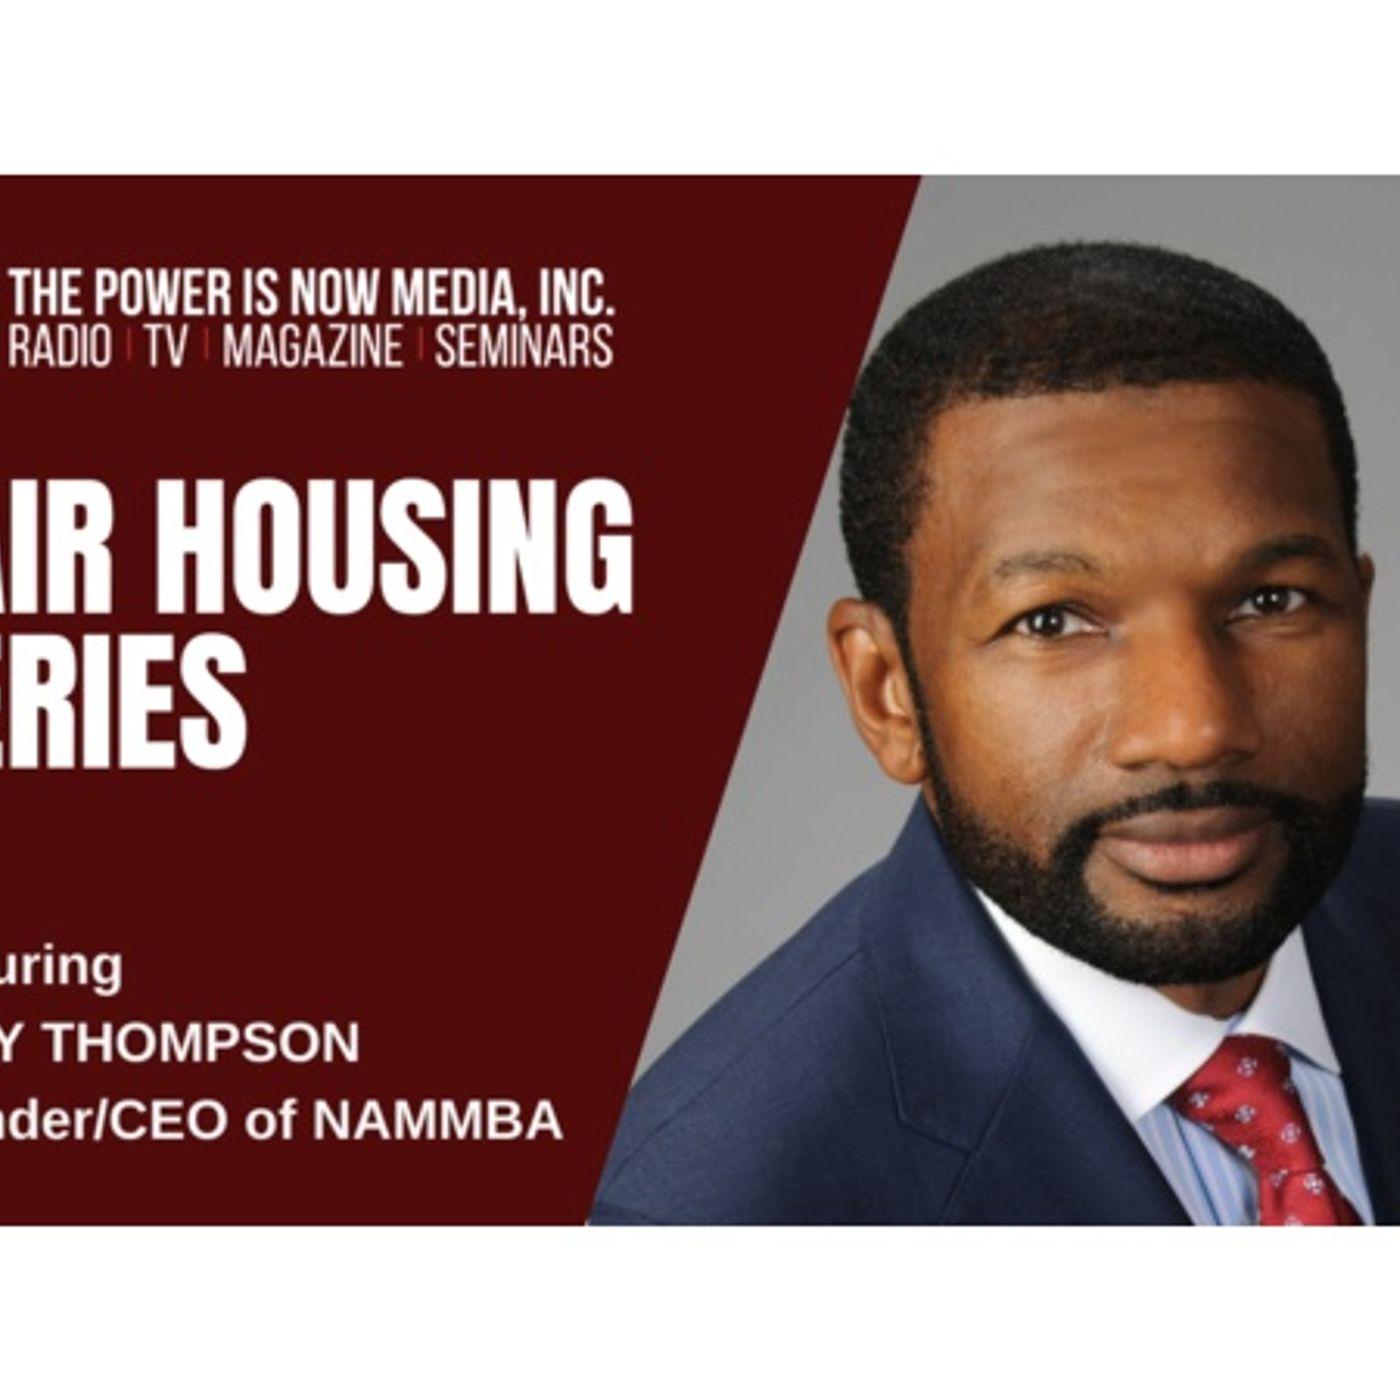 The Power Is Now Media Fair Housing Series 2021: Tony Thompson